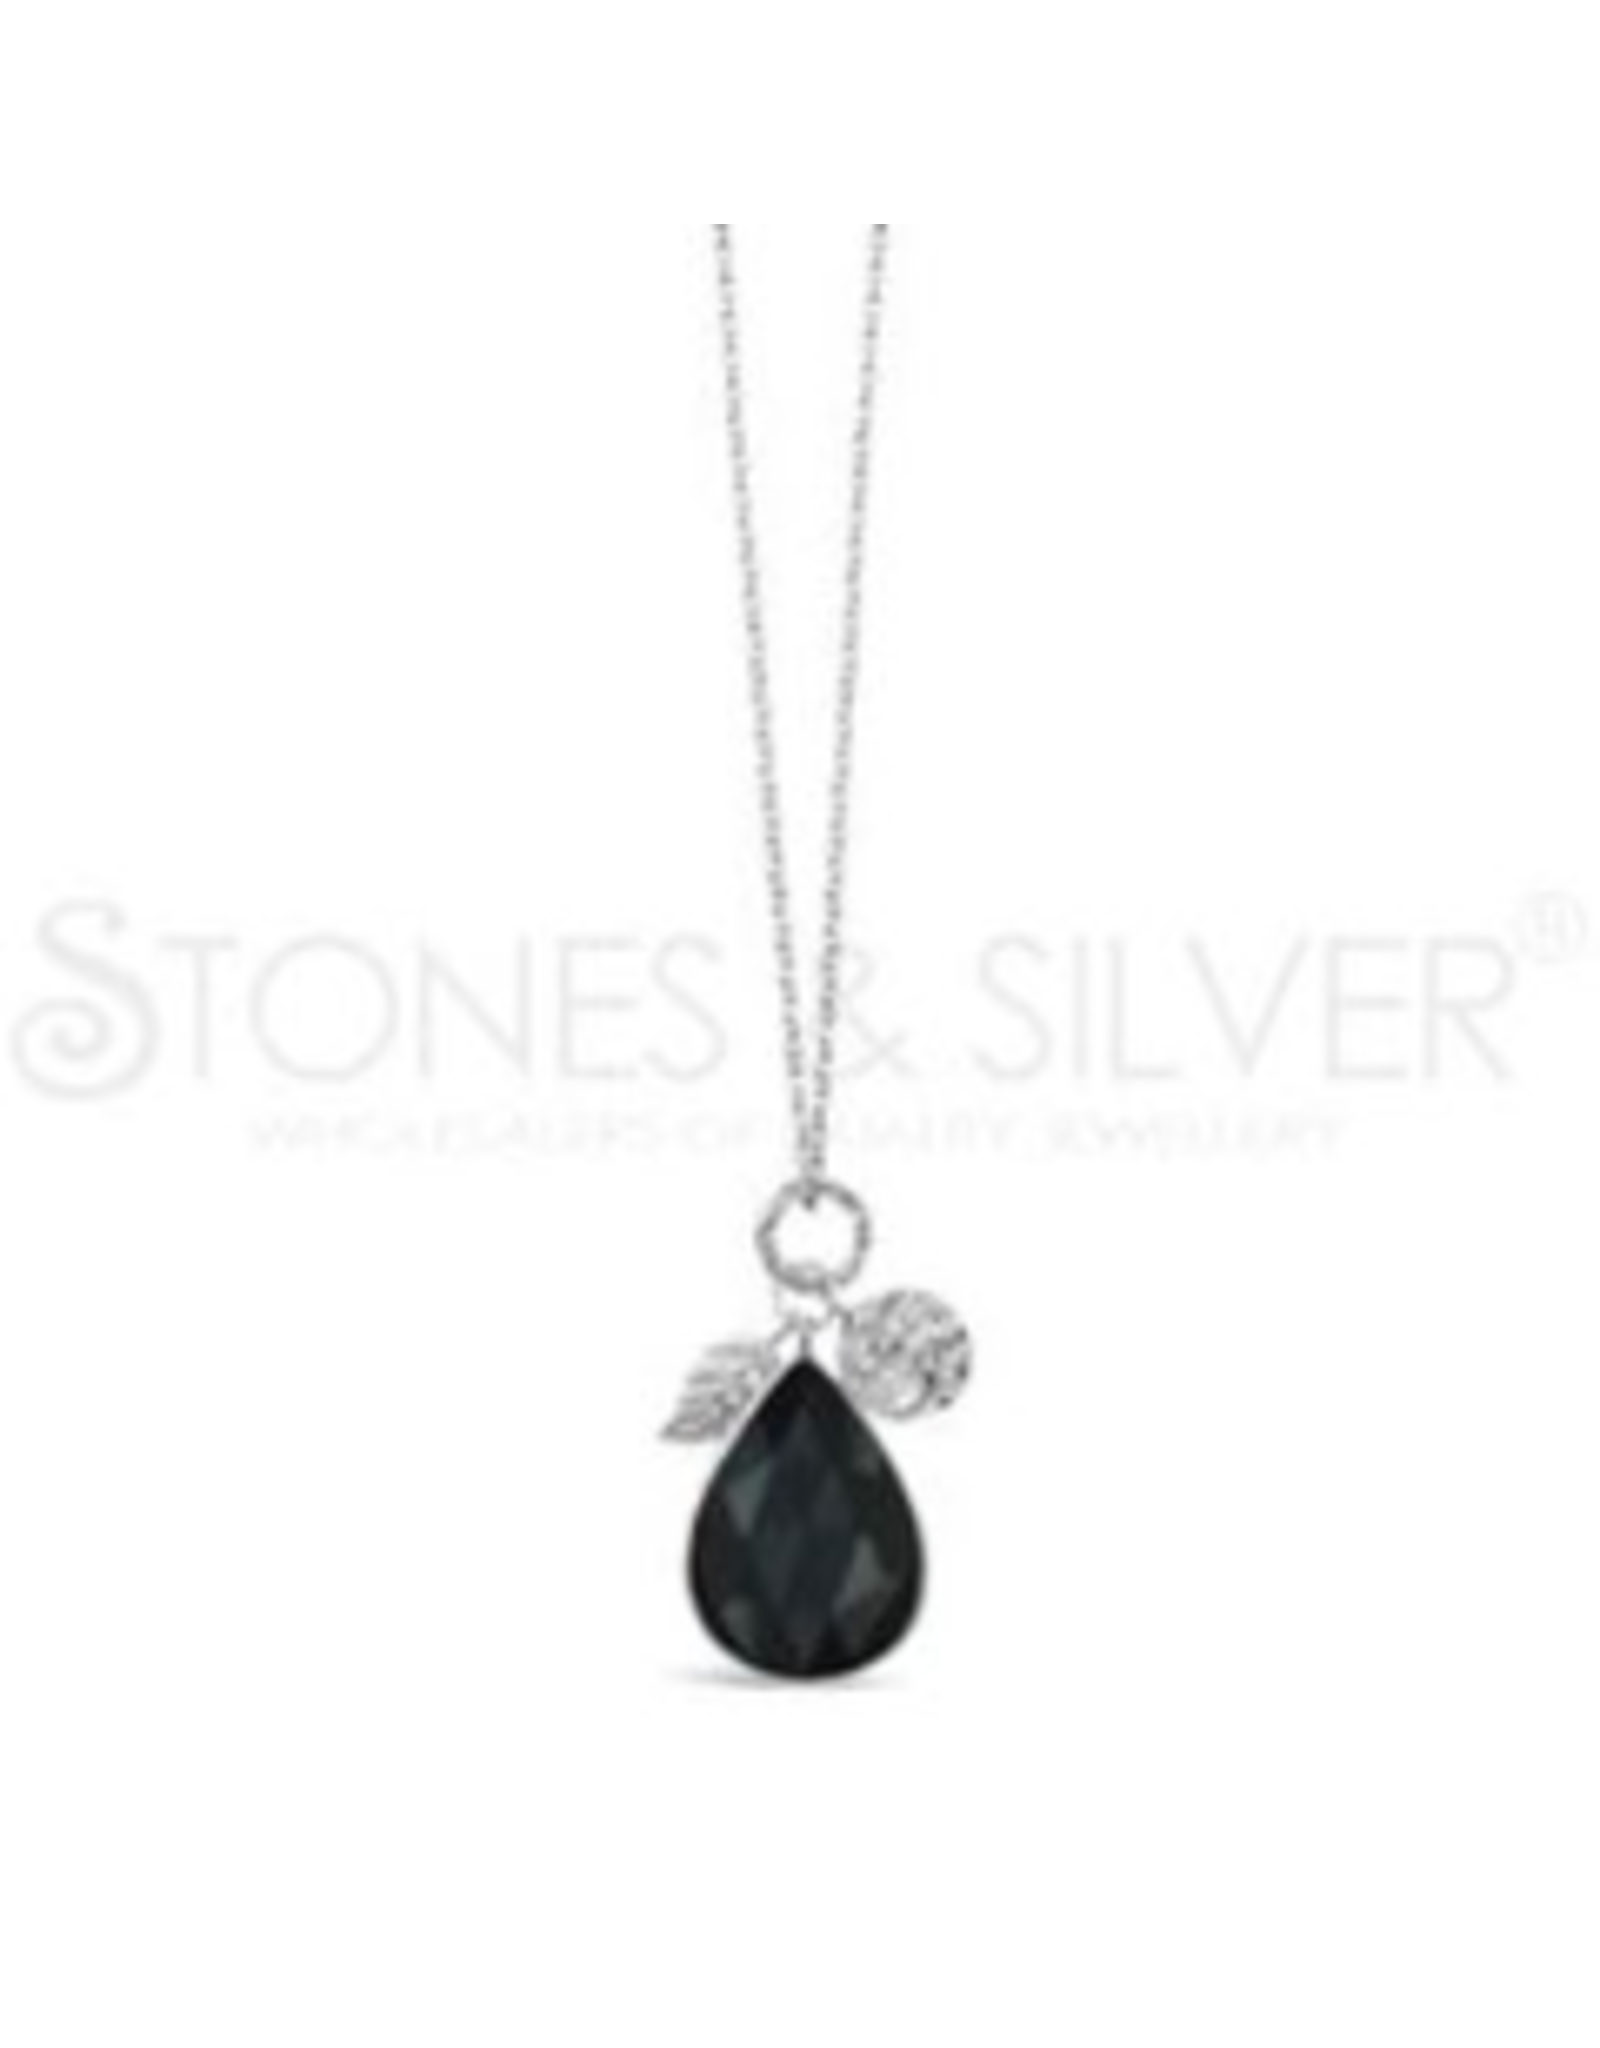 Stones & Silver Rhod Onyx Necklace 70cm